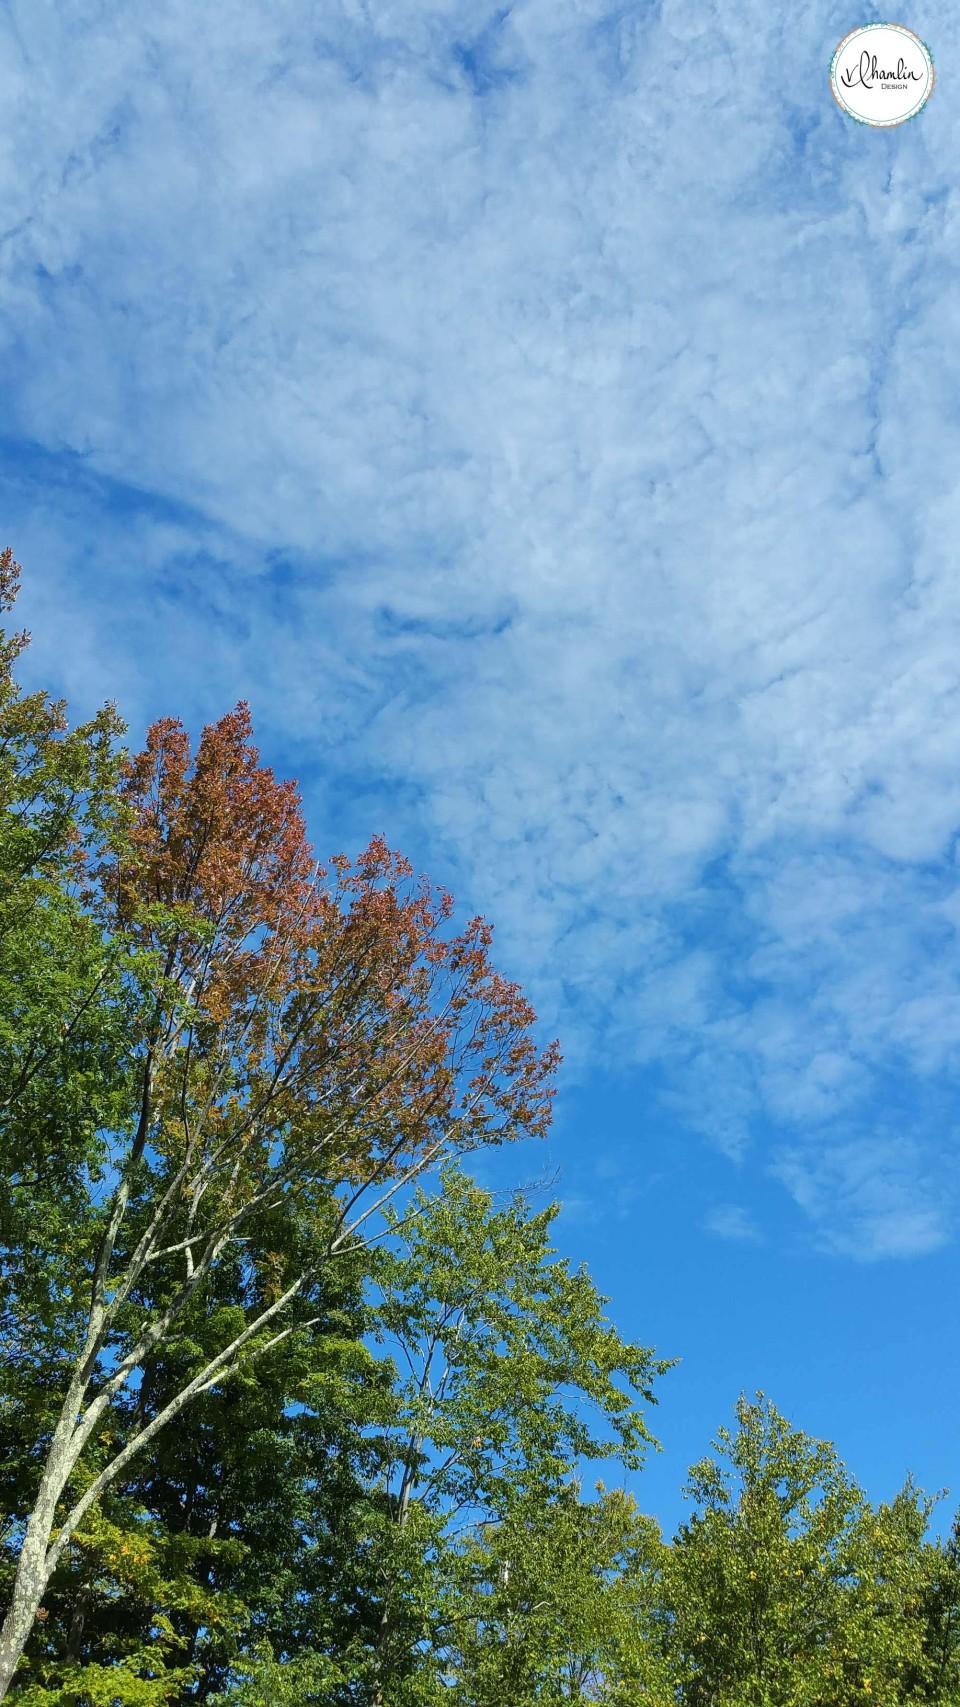 Fall snapshots 4